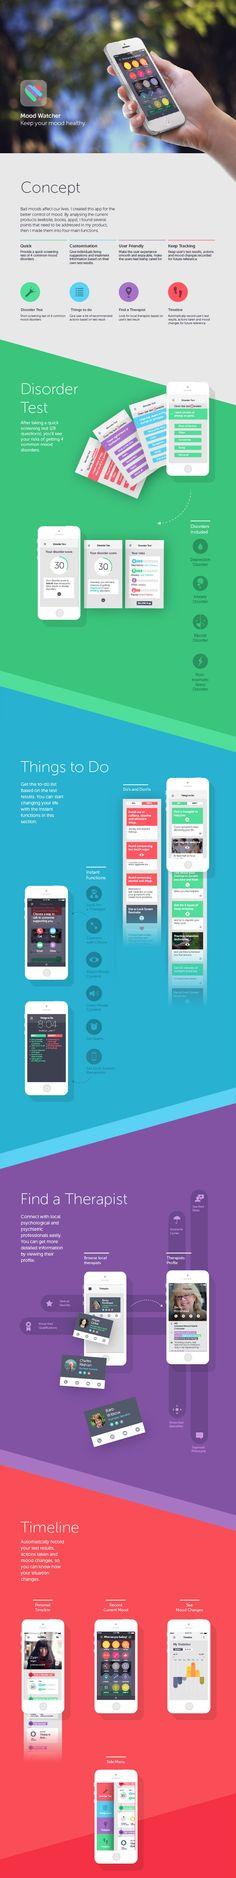 Mood Watcher – App for Better Mood